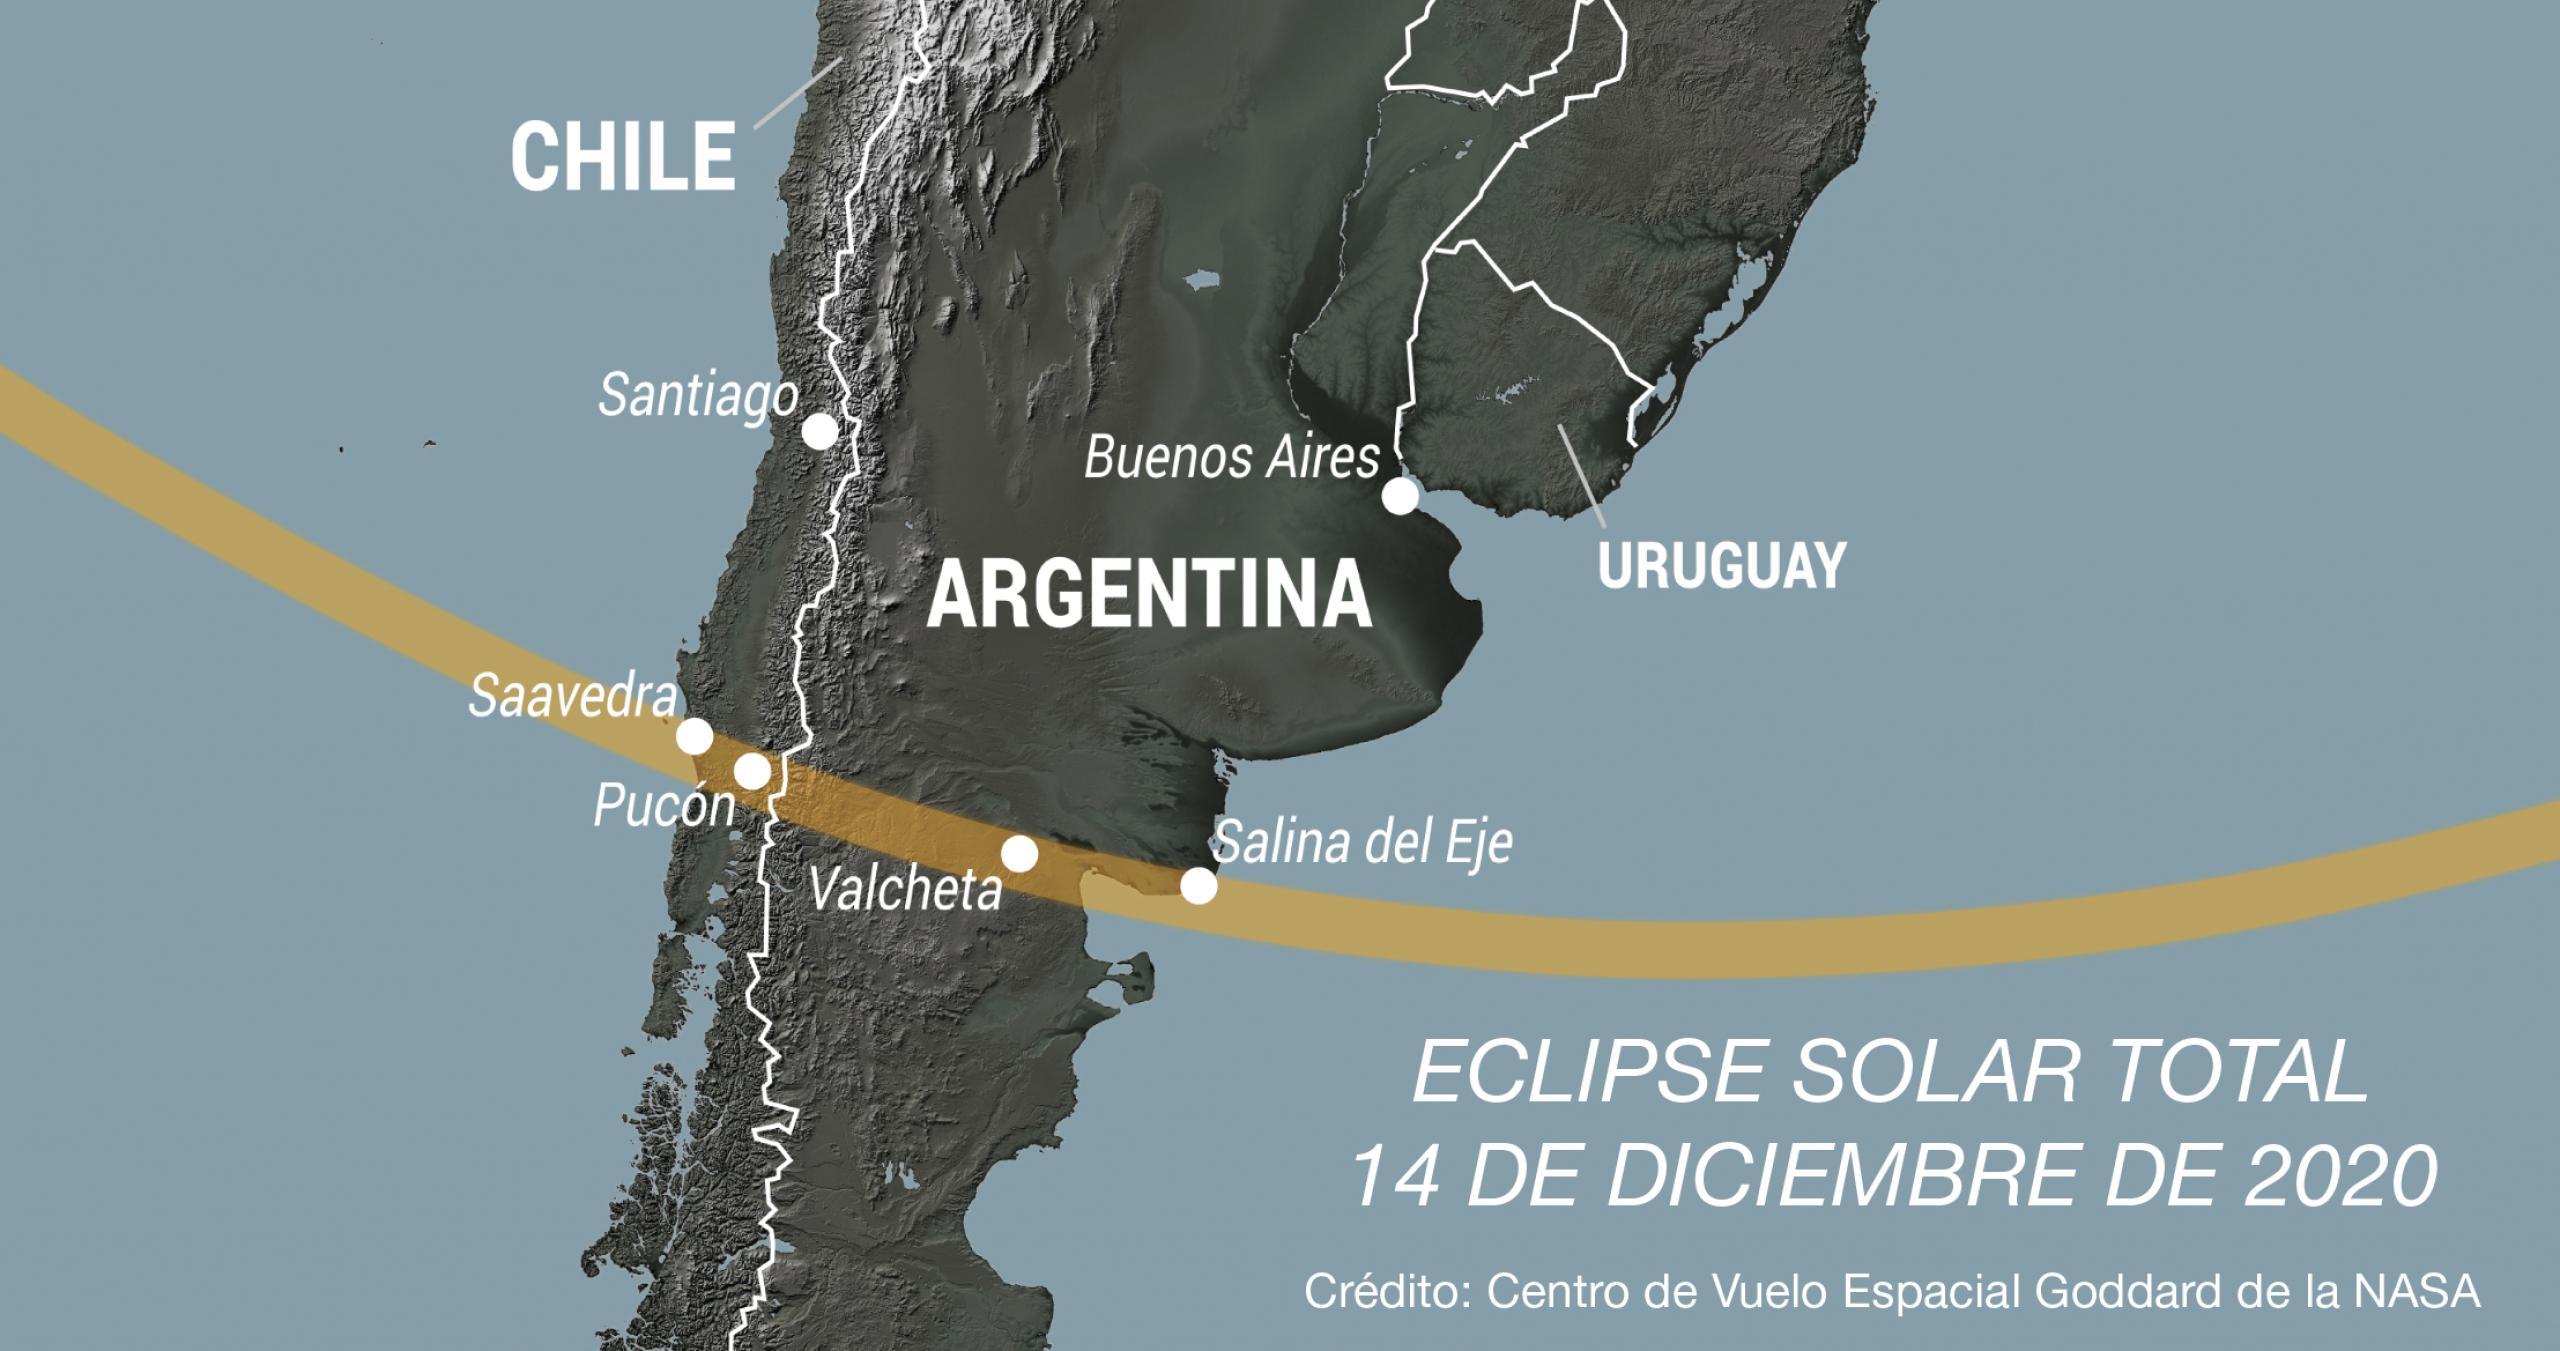 EclipsePath_2020_wTxt.jpeg